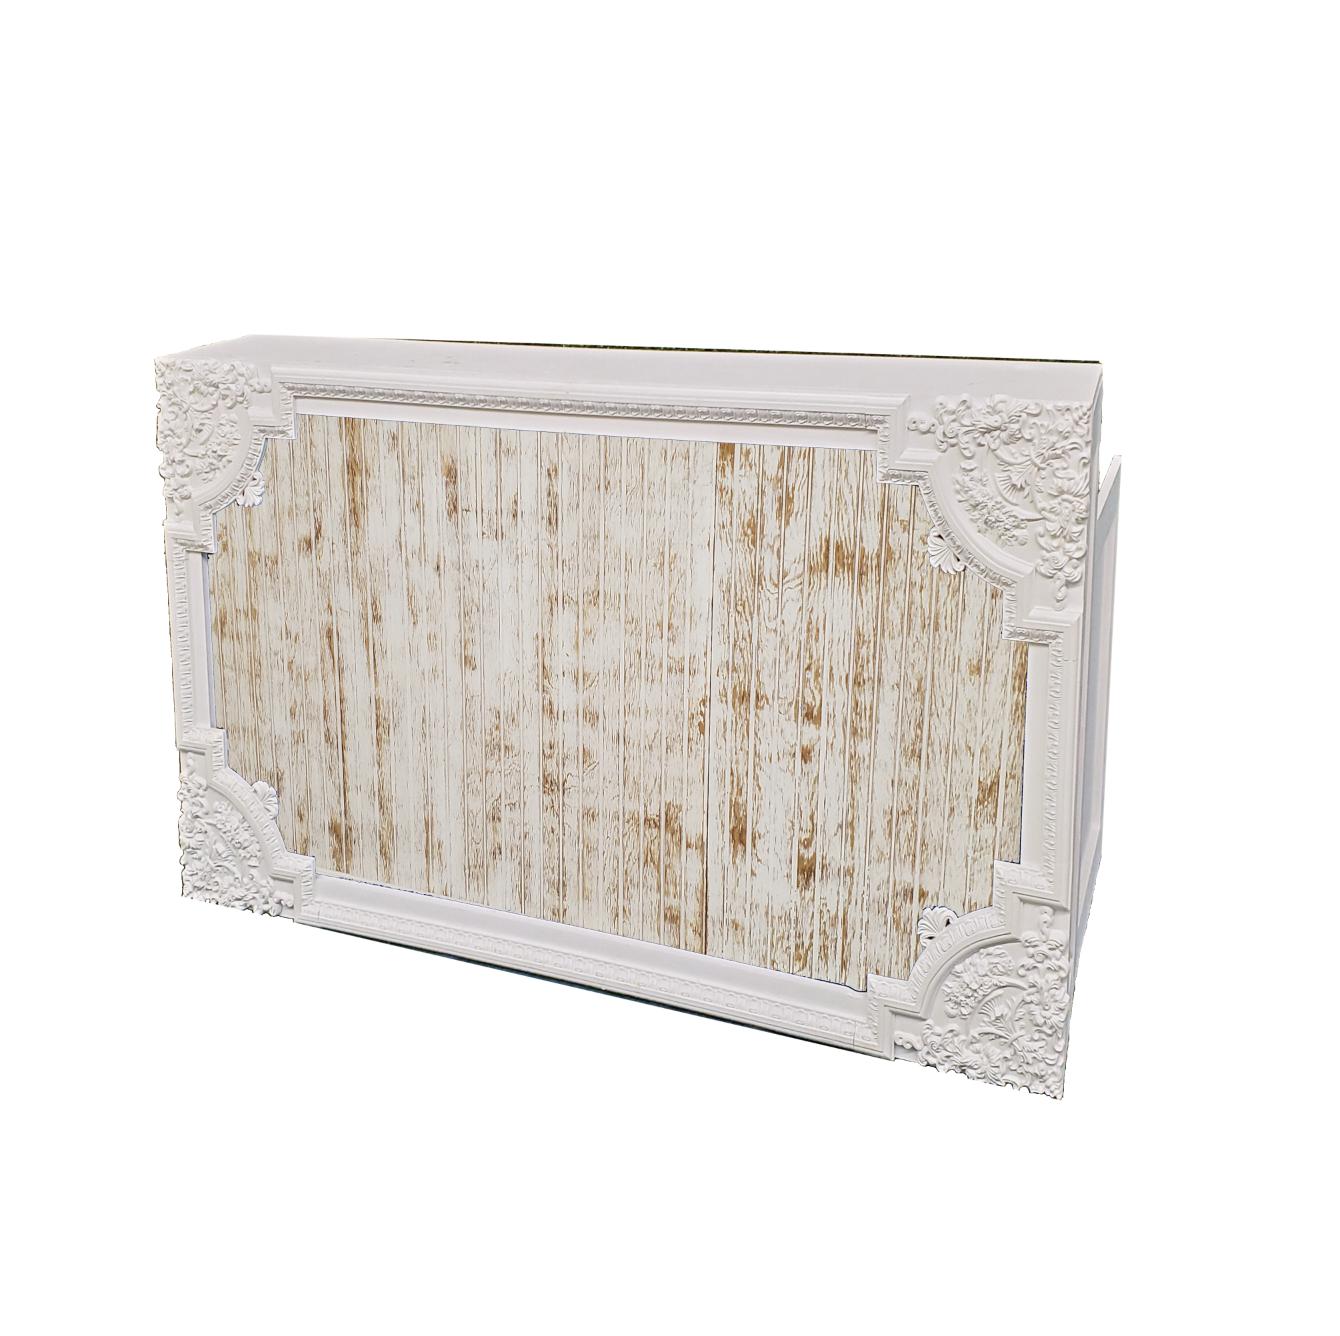 Cora Bar w/ White Washed Insert $250